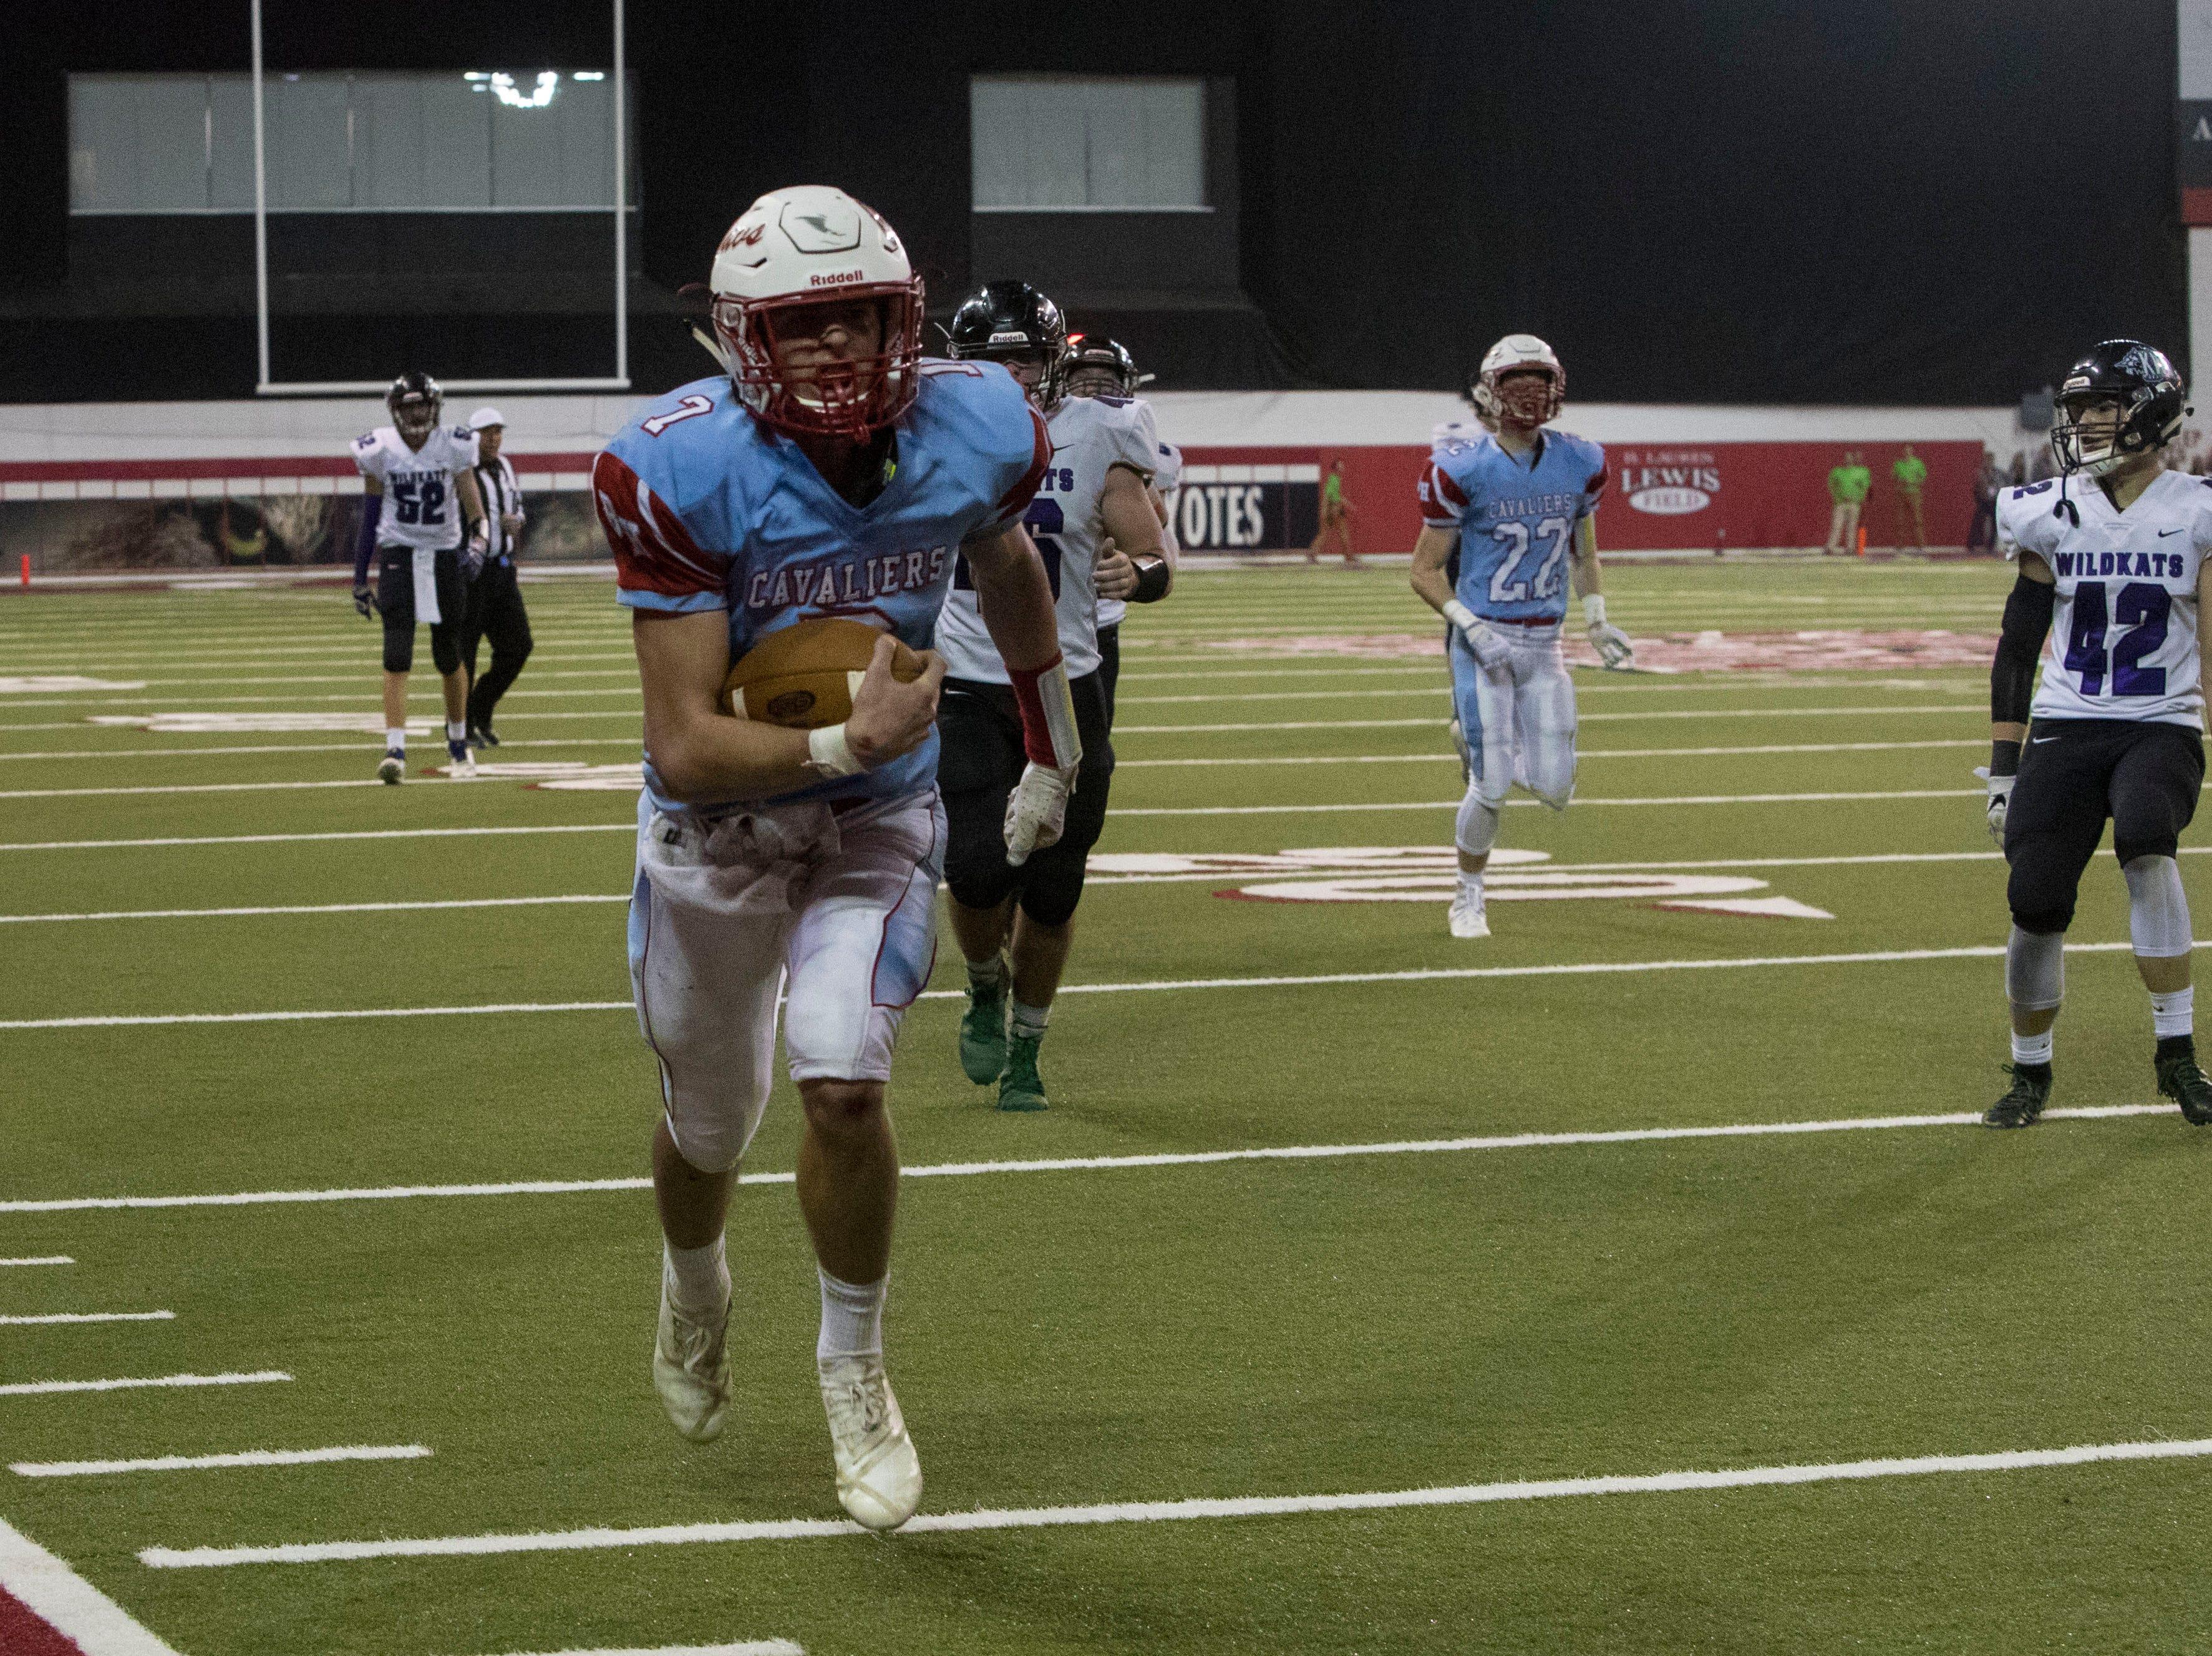 Bon Homme's Joey Slama (7) scores a touchdown during a game against Kimball/White Lake, Thursday, Nov. 8, 2018 at the DakotaDome in Vermillion, S.D.